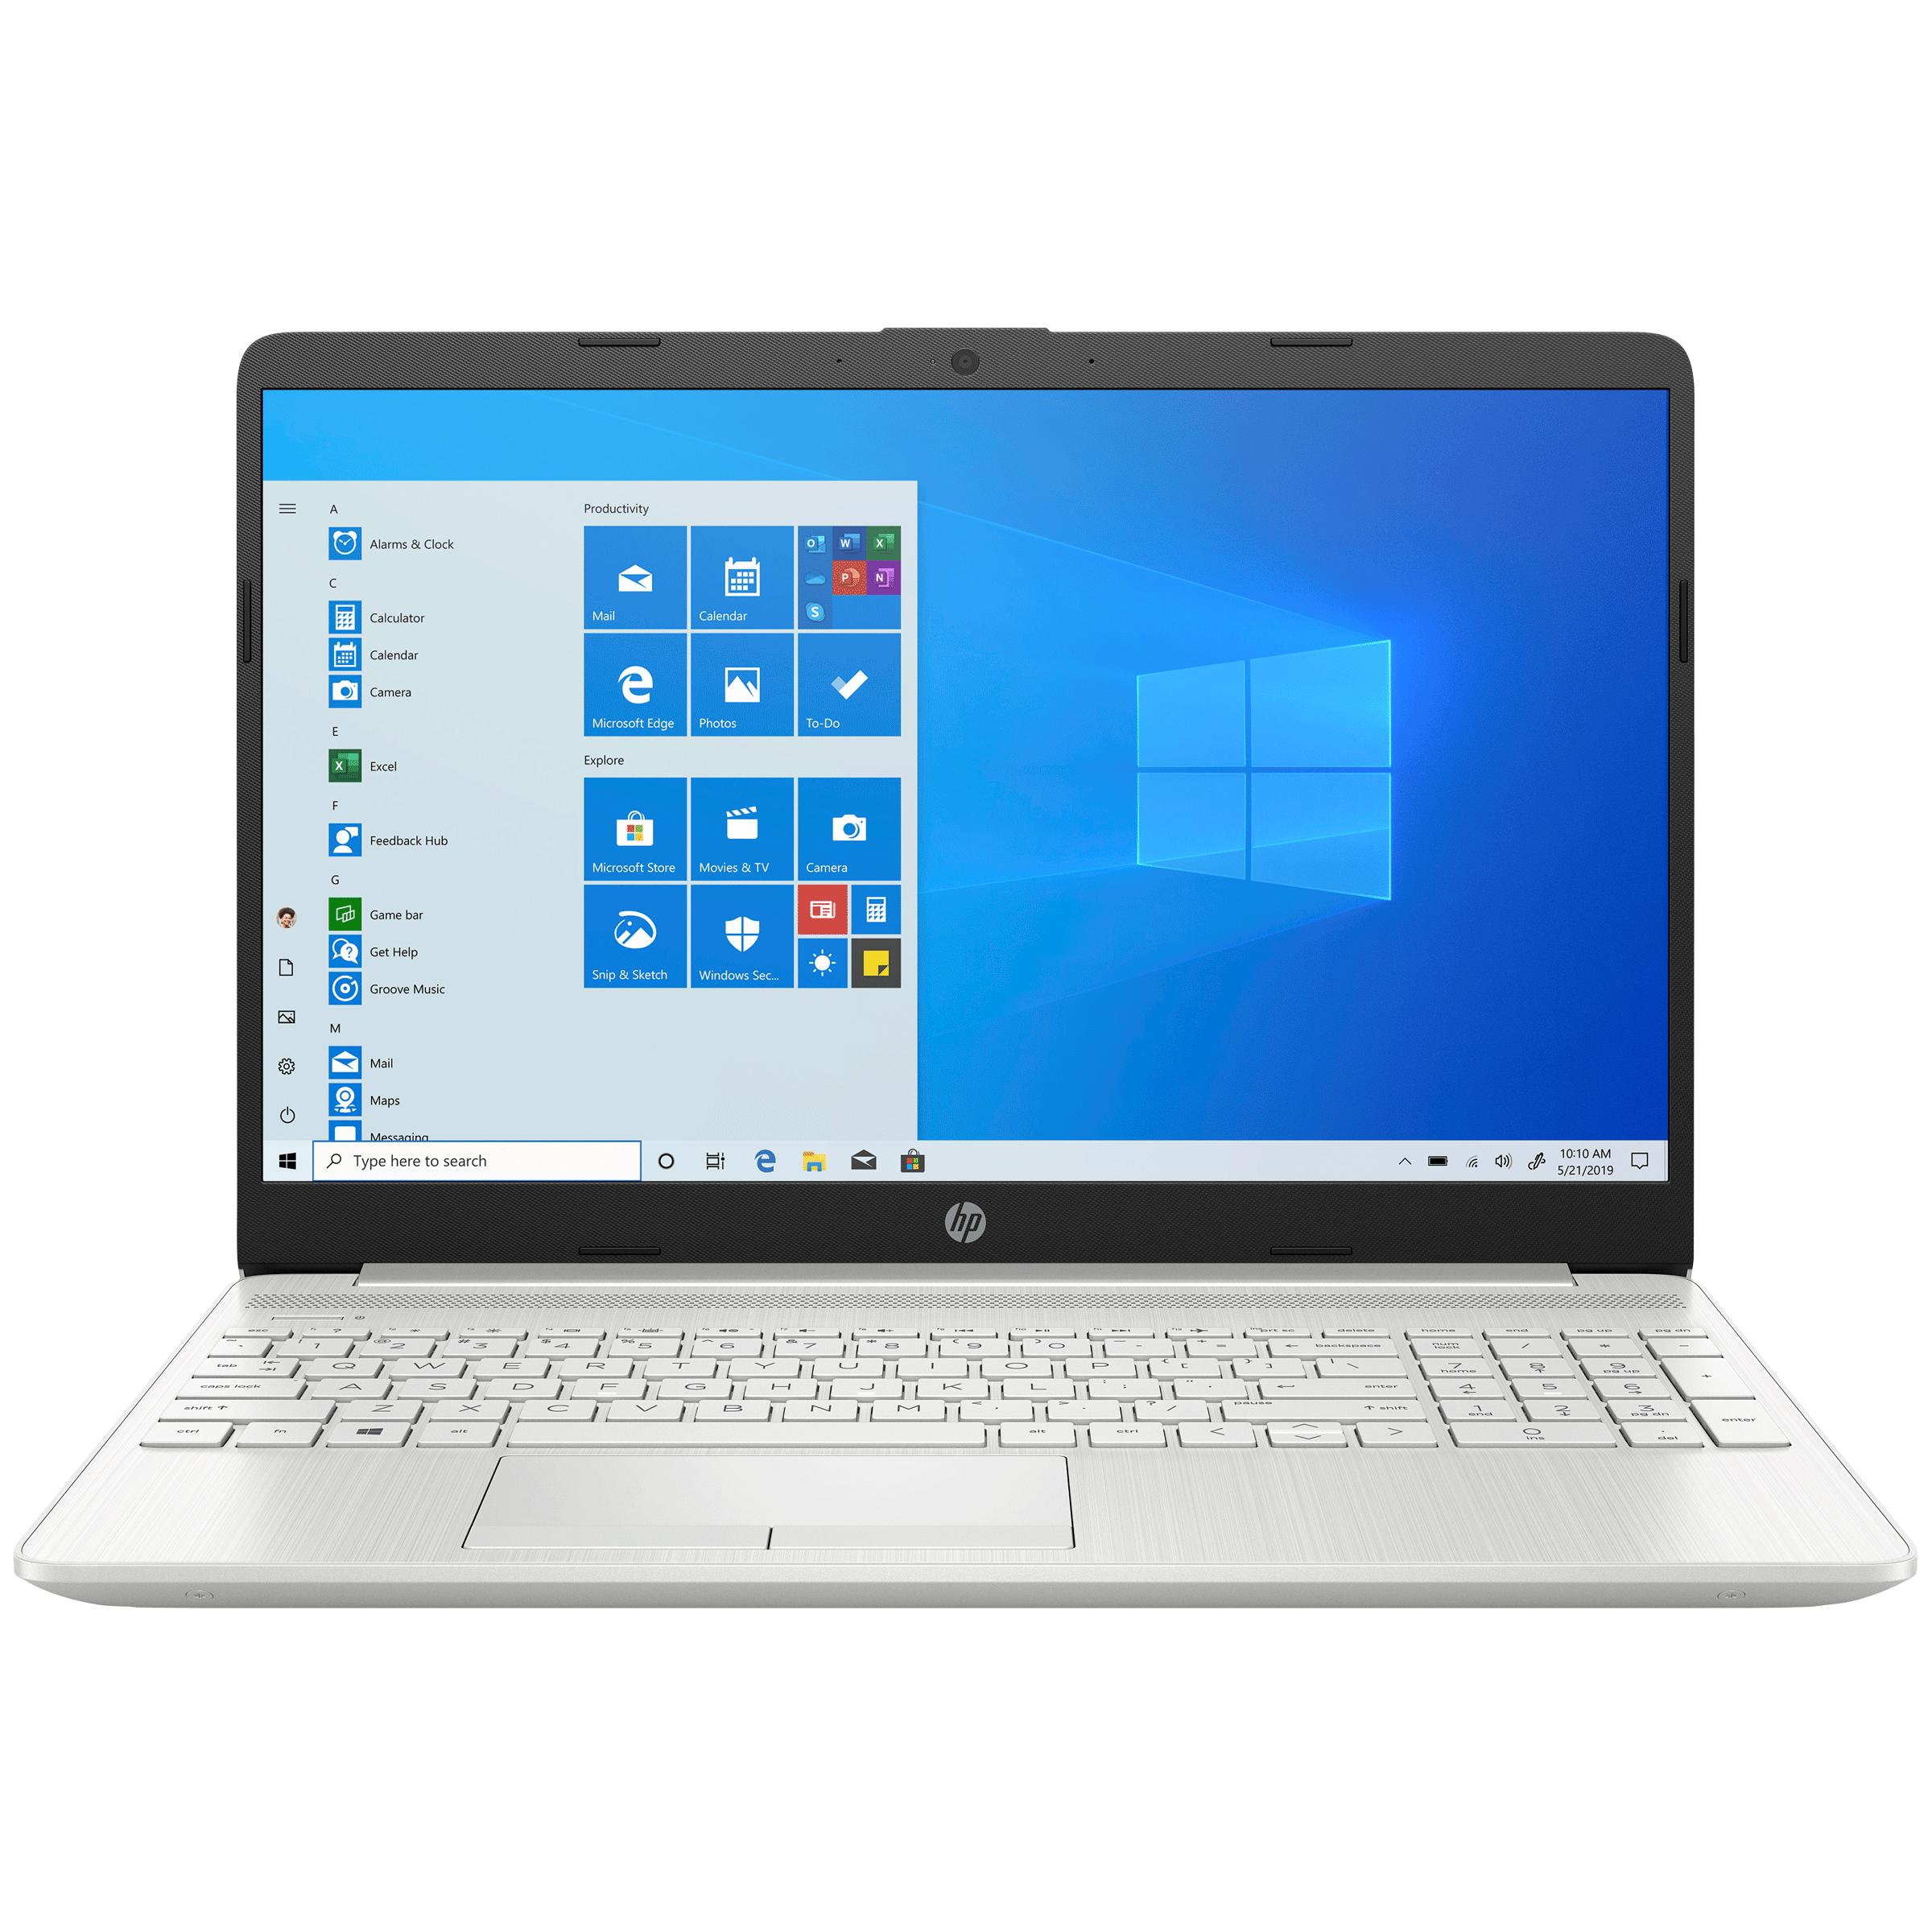 HP 15s-gr0500AU (440L7PA#ACJ) Ryzen 5 Windows 10 Home Laptop (8GB RAM, 512GB SSD, AMD Radeon Vega 8 Graphics, MS Office, 39.62cm, Natural Silver)_1